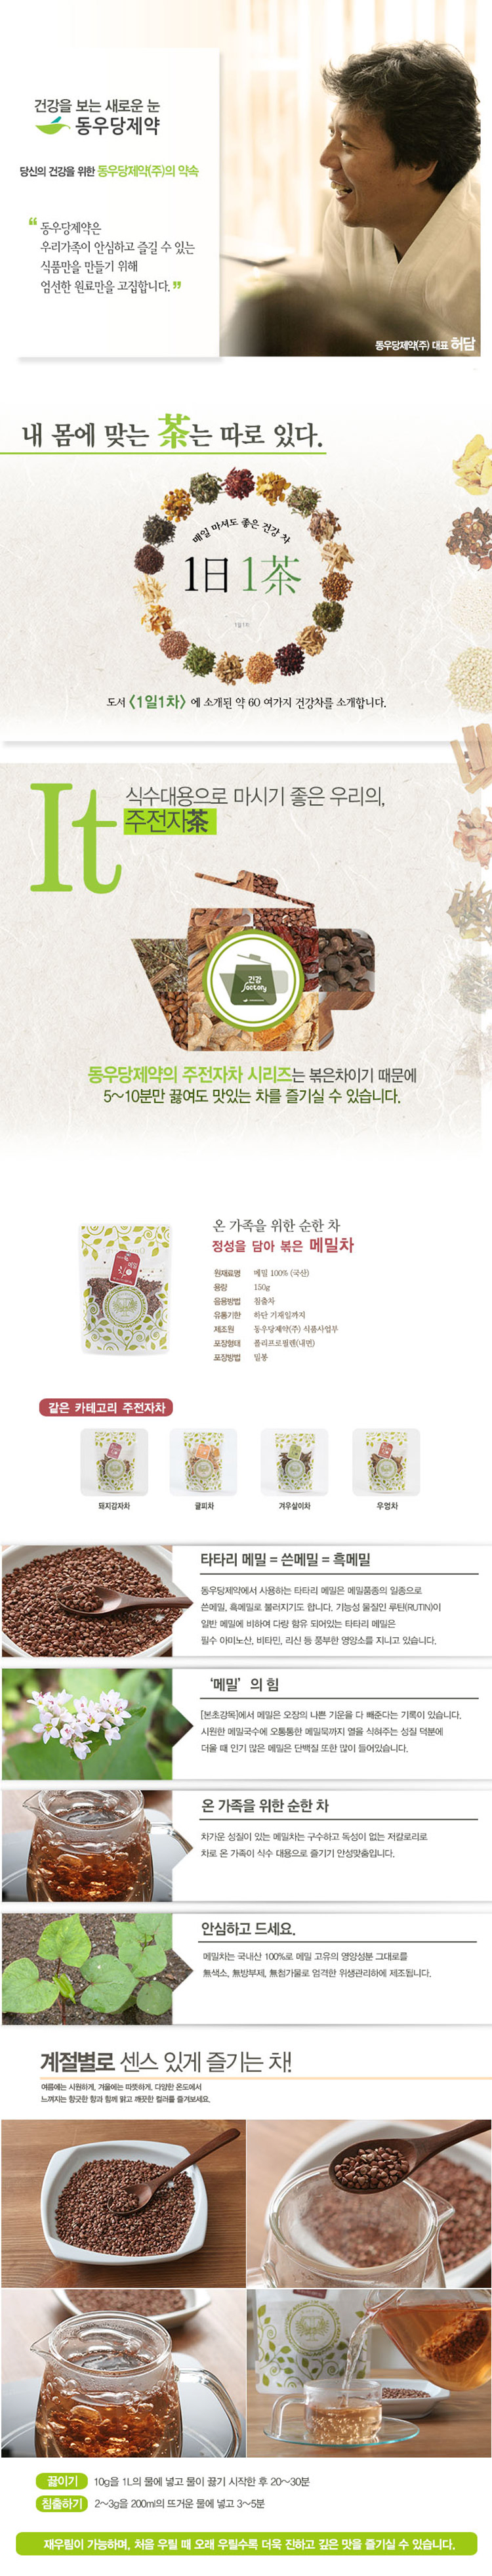 [ DongWuDangMedicine ] [D3][OmniHerb]Roasted Buckwheat Tea 150g